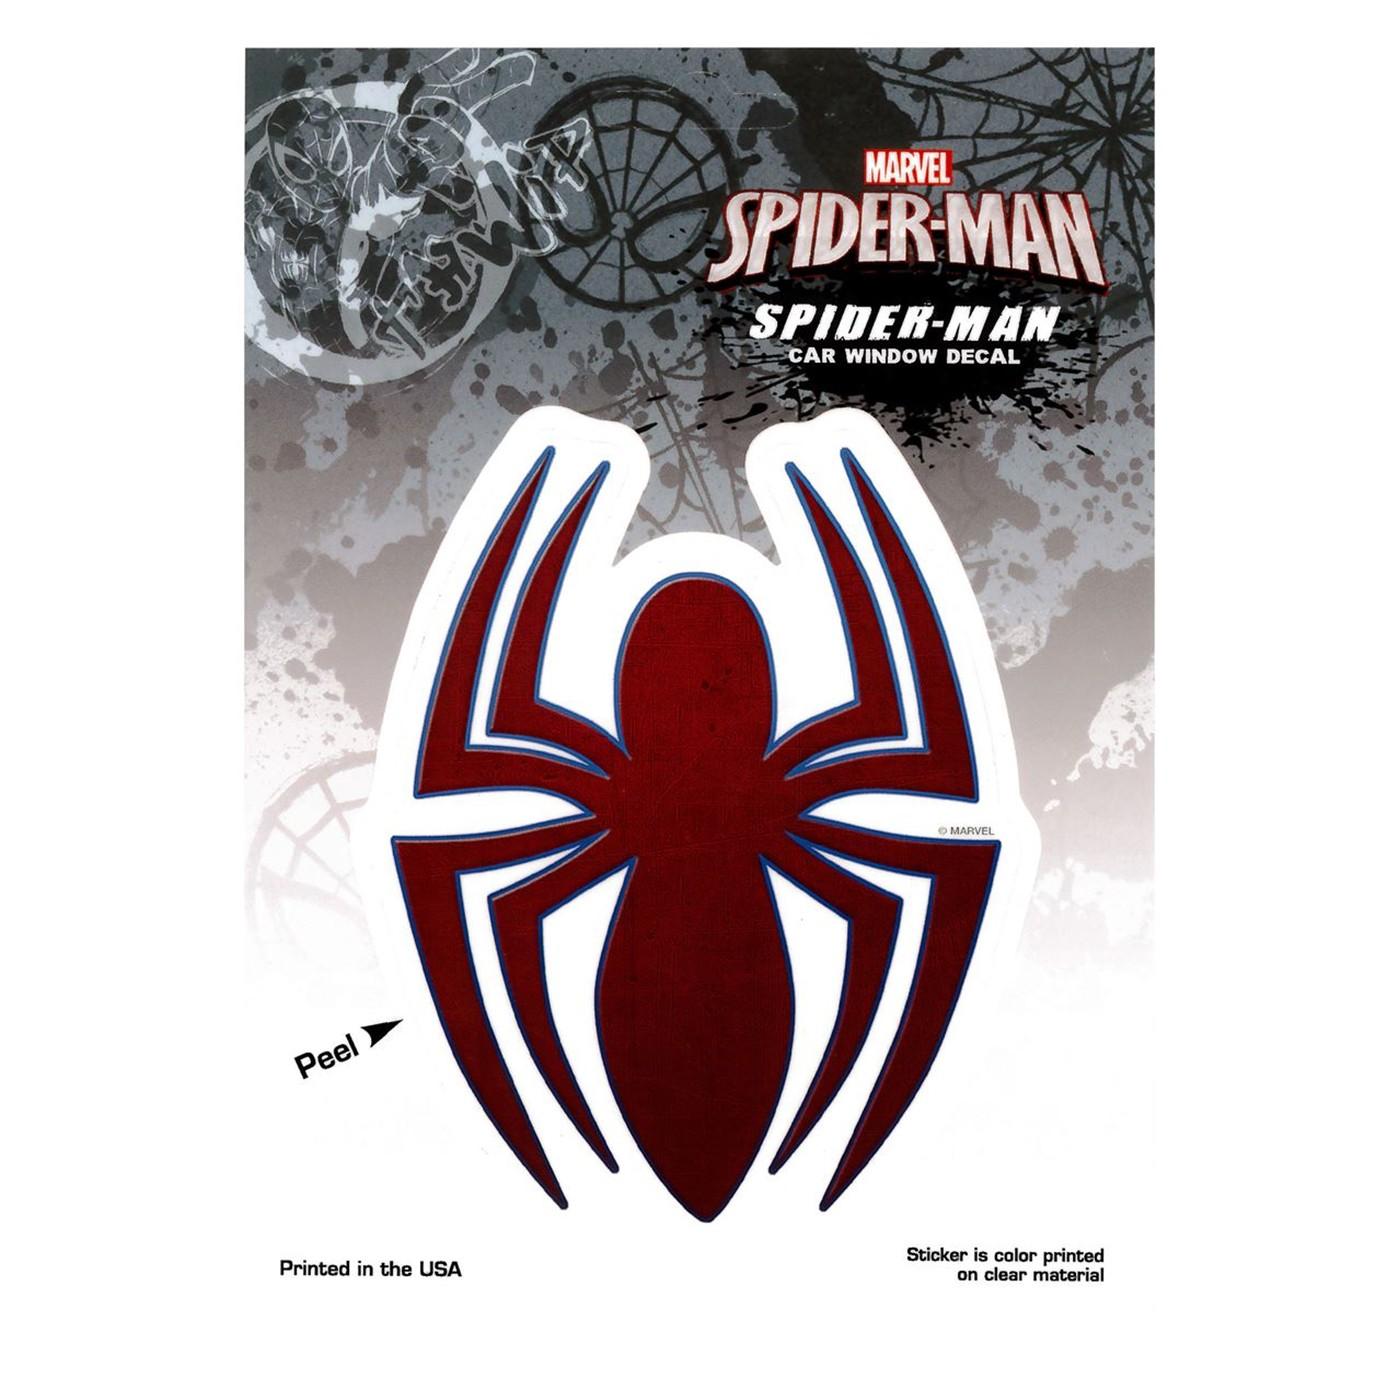 Spiderman Ultimate Symbol Decal